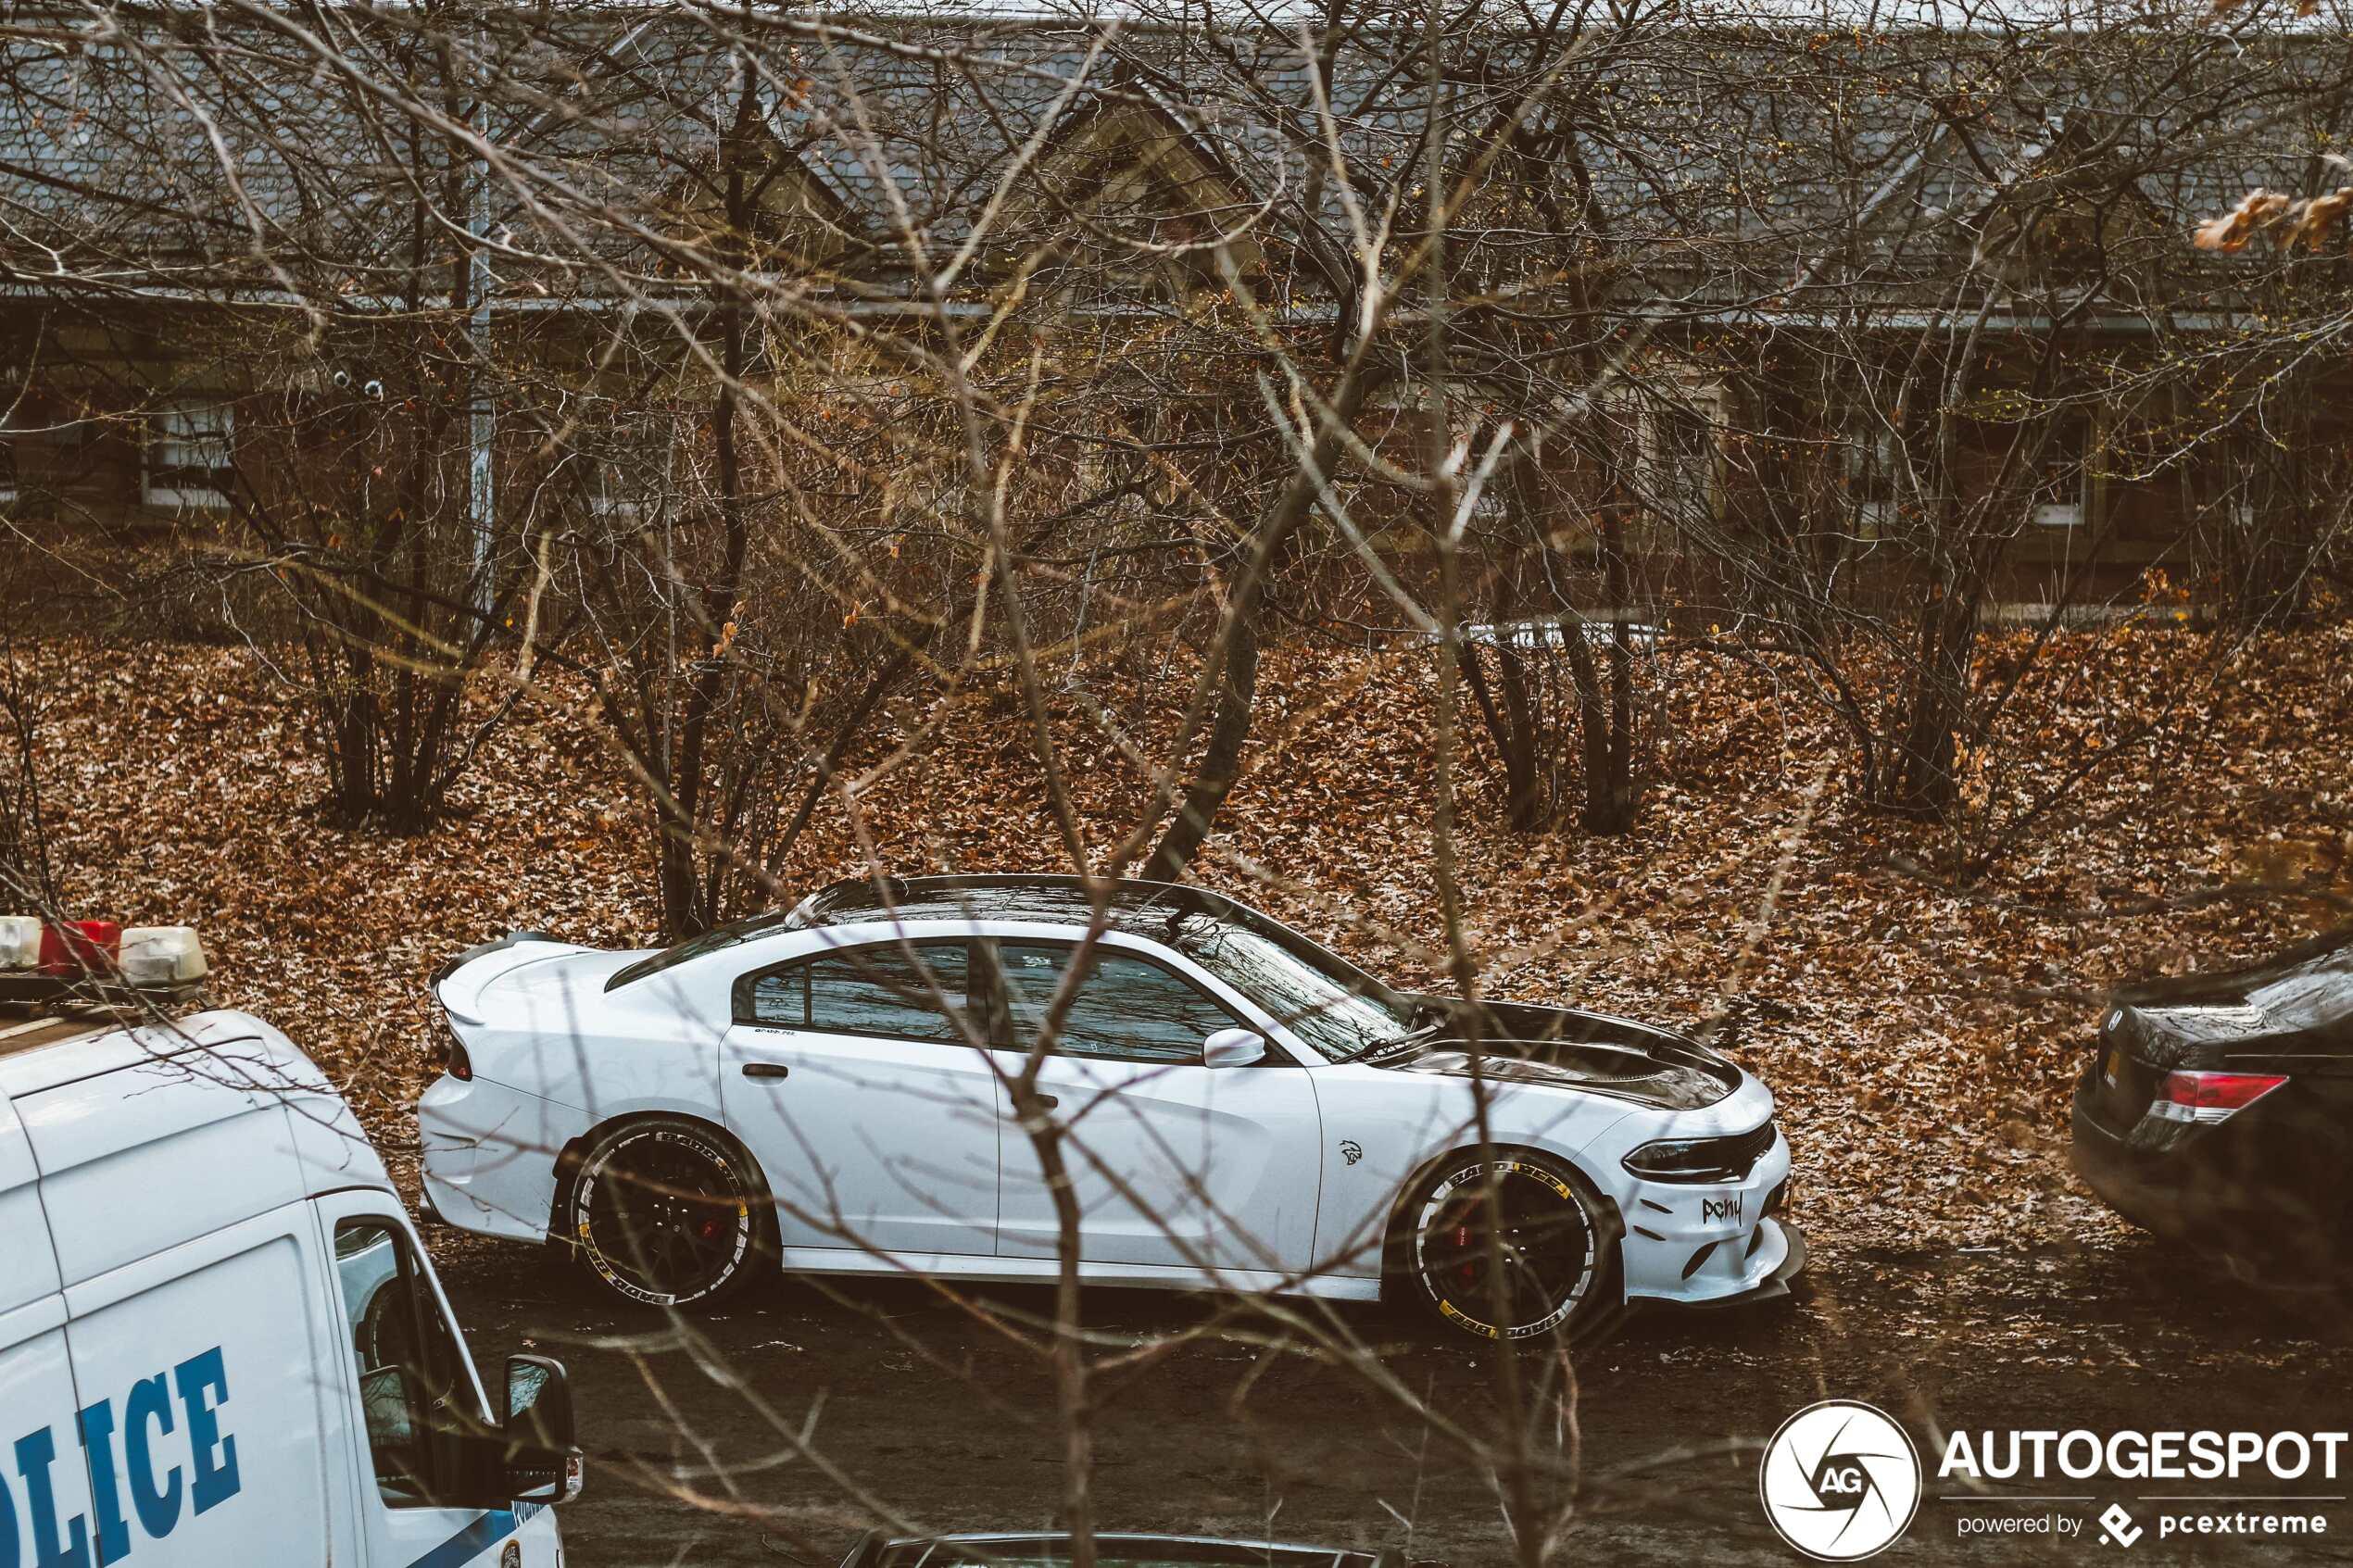 Dodge Charger Srt Hellcat 2015 13 January 2020 Autogespot